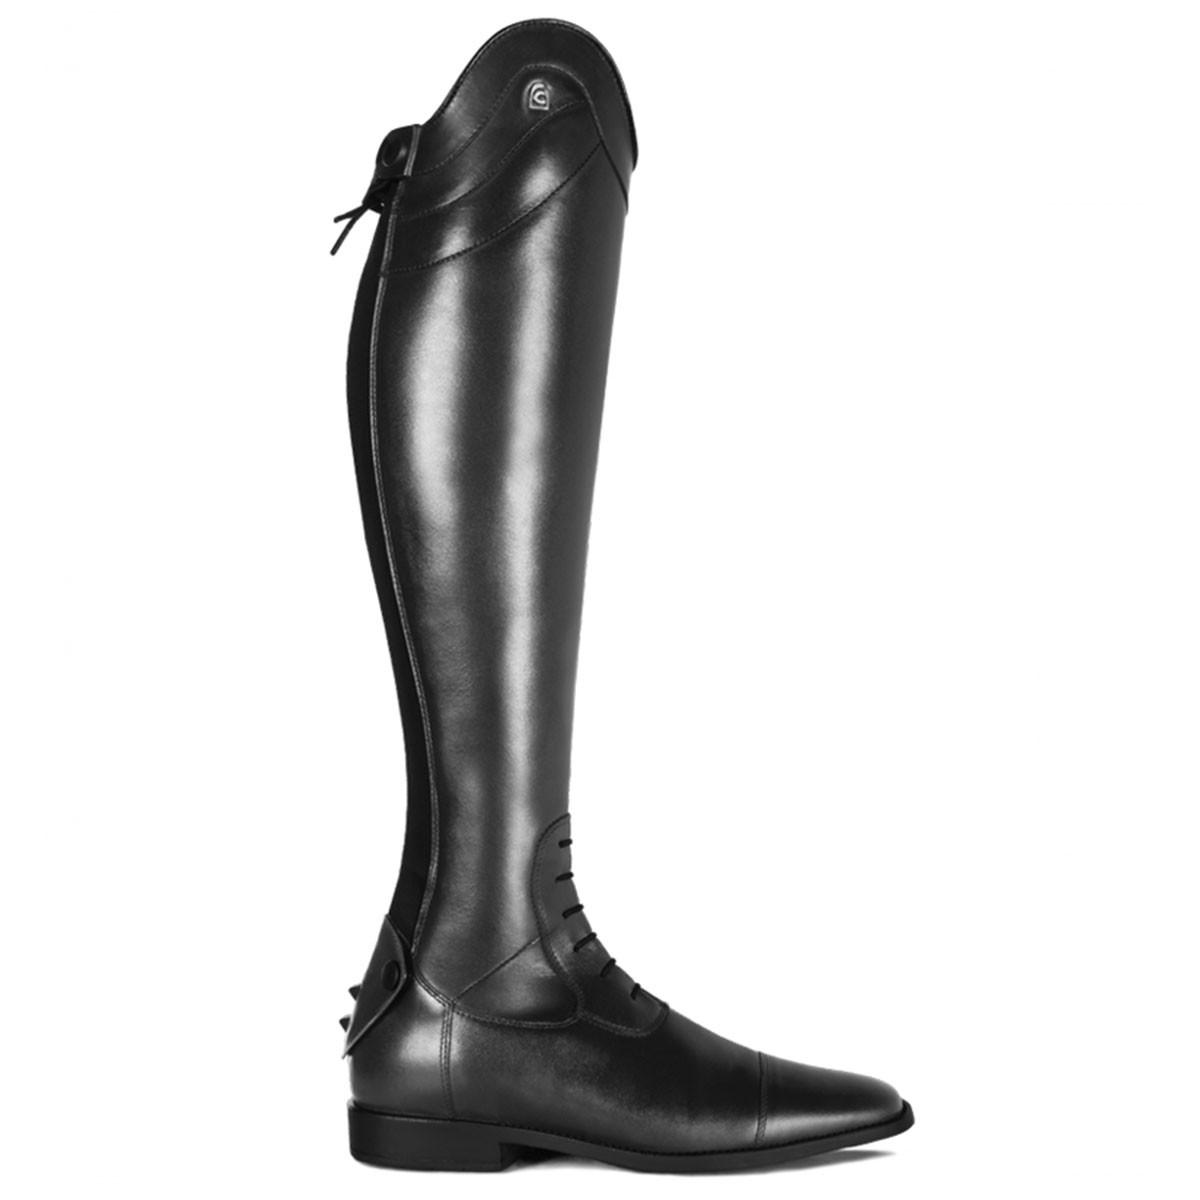 Cavallo Linus Slim rijlaars zwart maat:10-10.5 / h51-w37